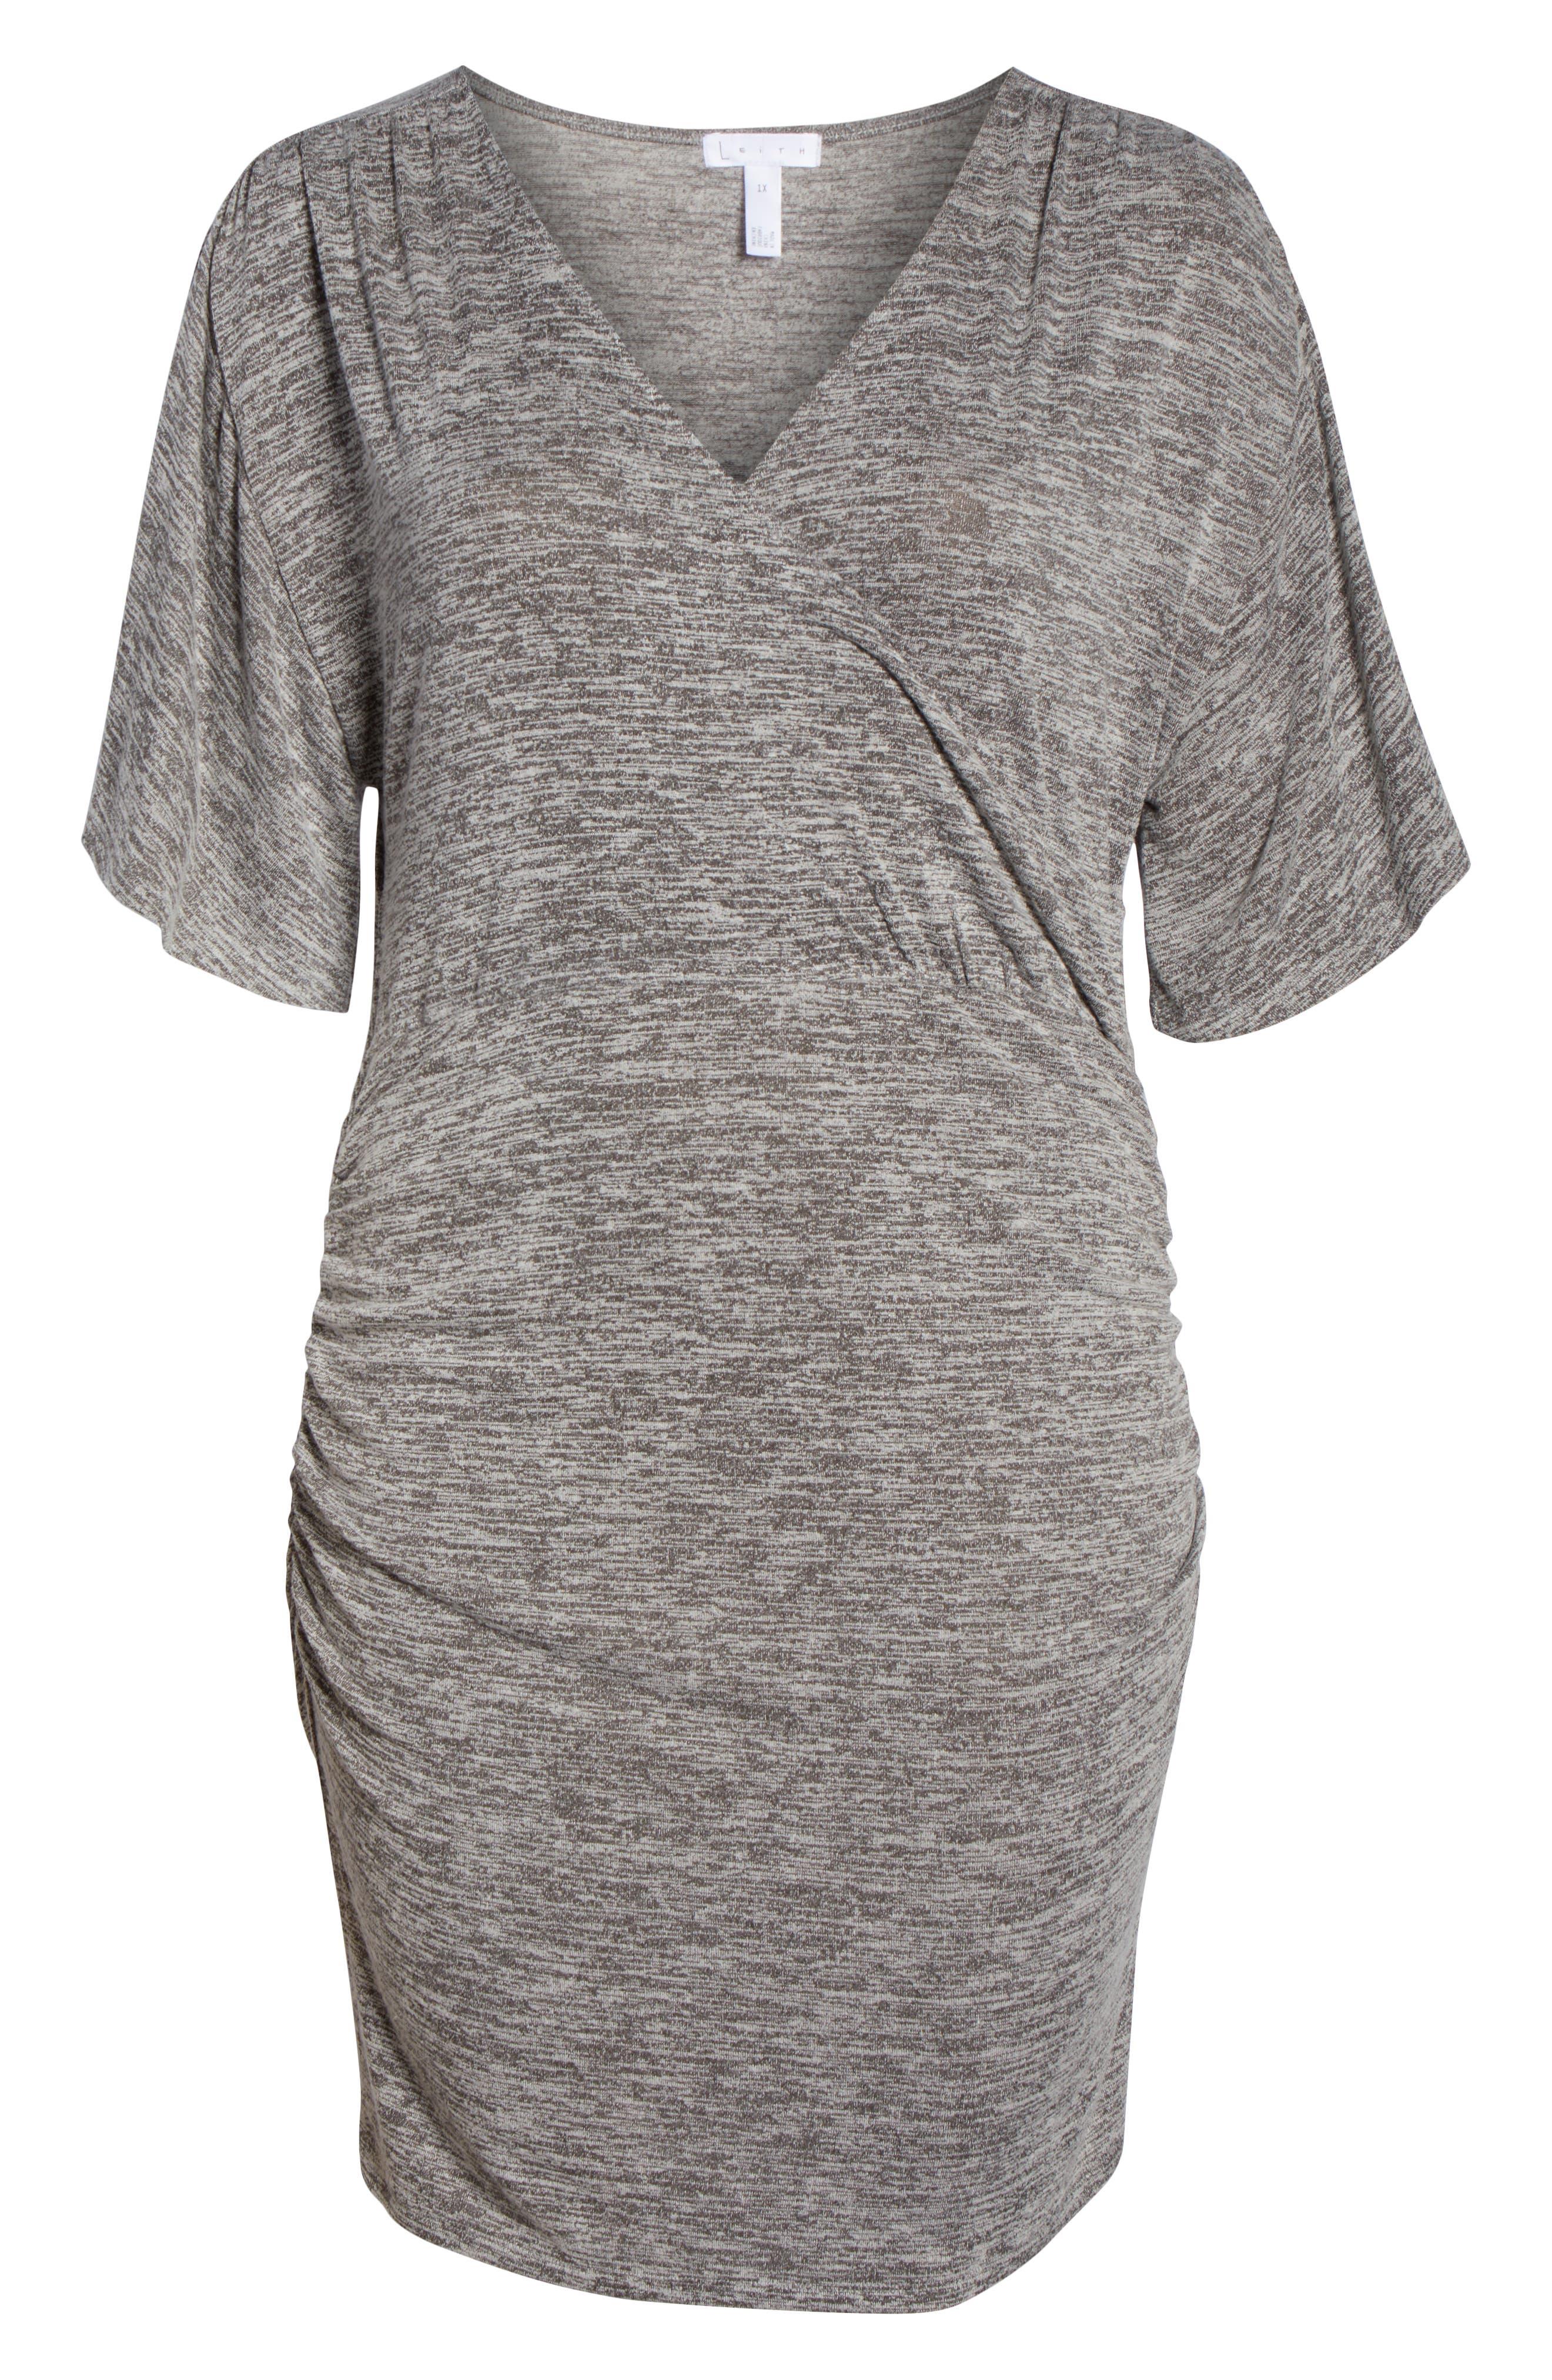 Wrap Dress,                             Alternate thumbnail 12, color,                             GREY CLOUDY HEATHER